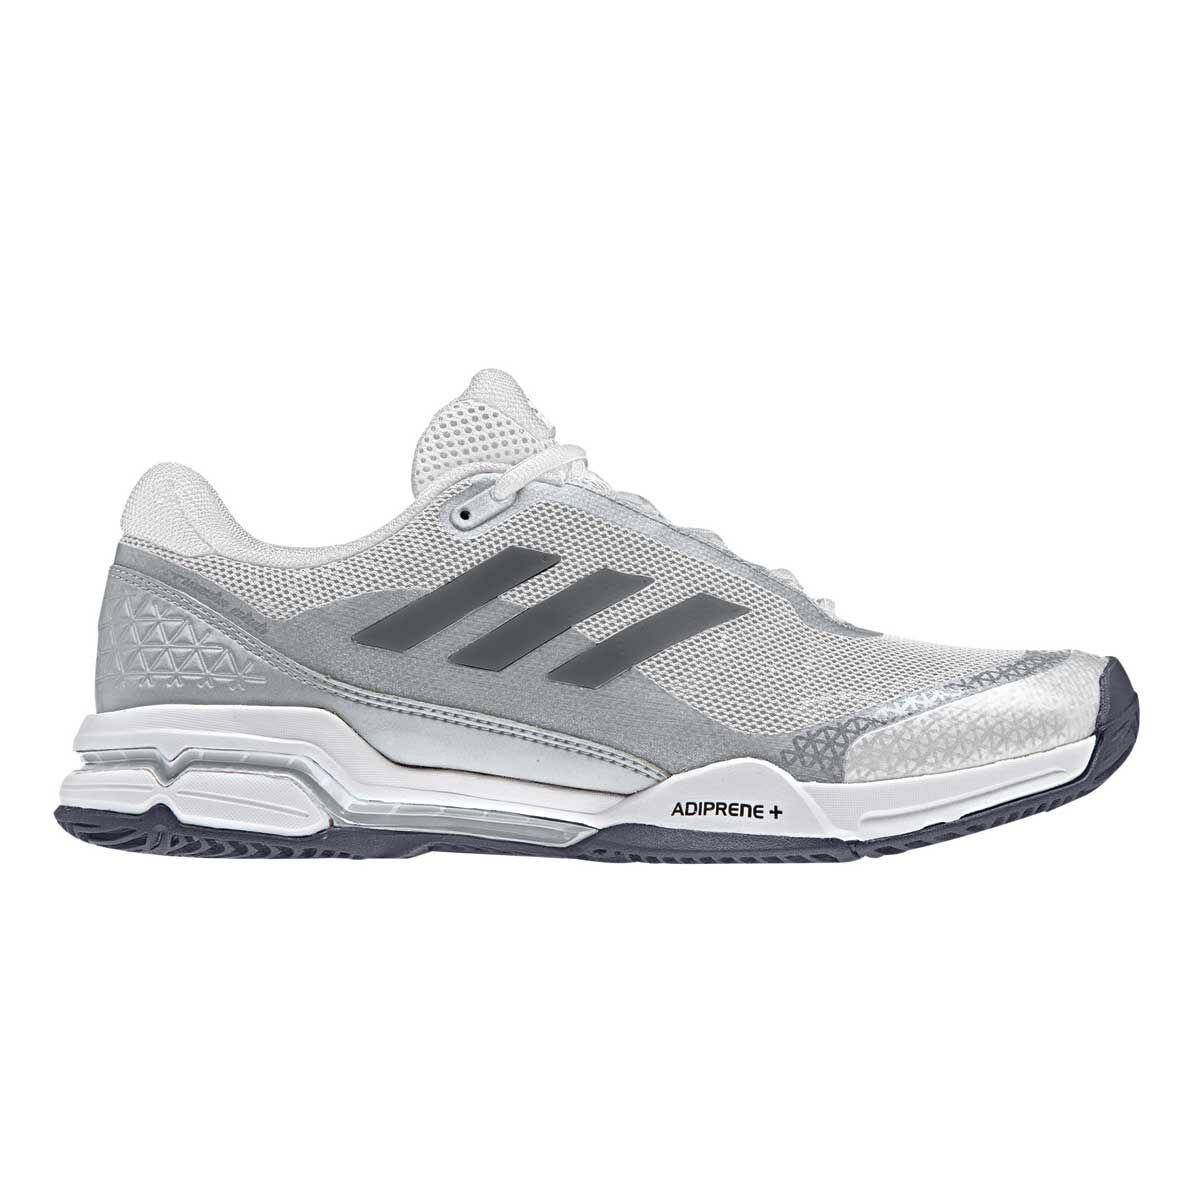 adidas Barricade Club Mens Tennis Shoes Black Silver US 7.5